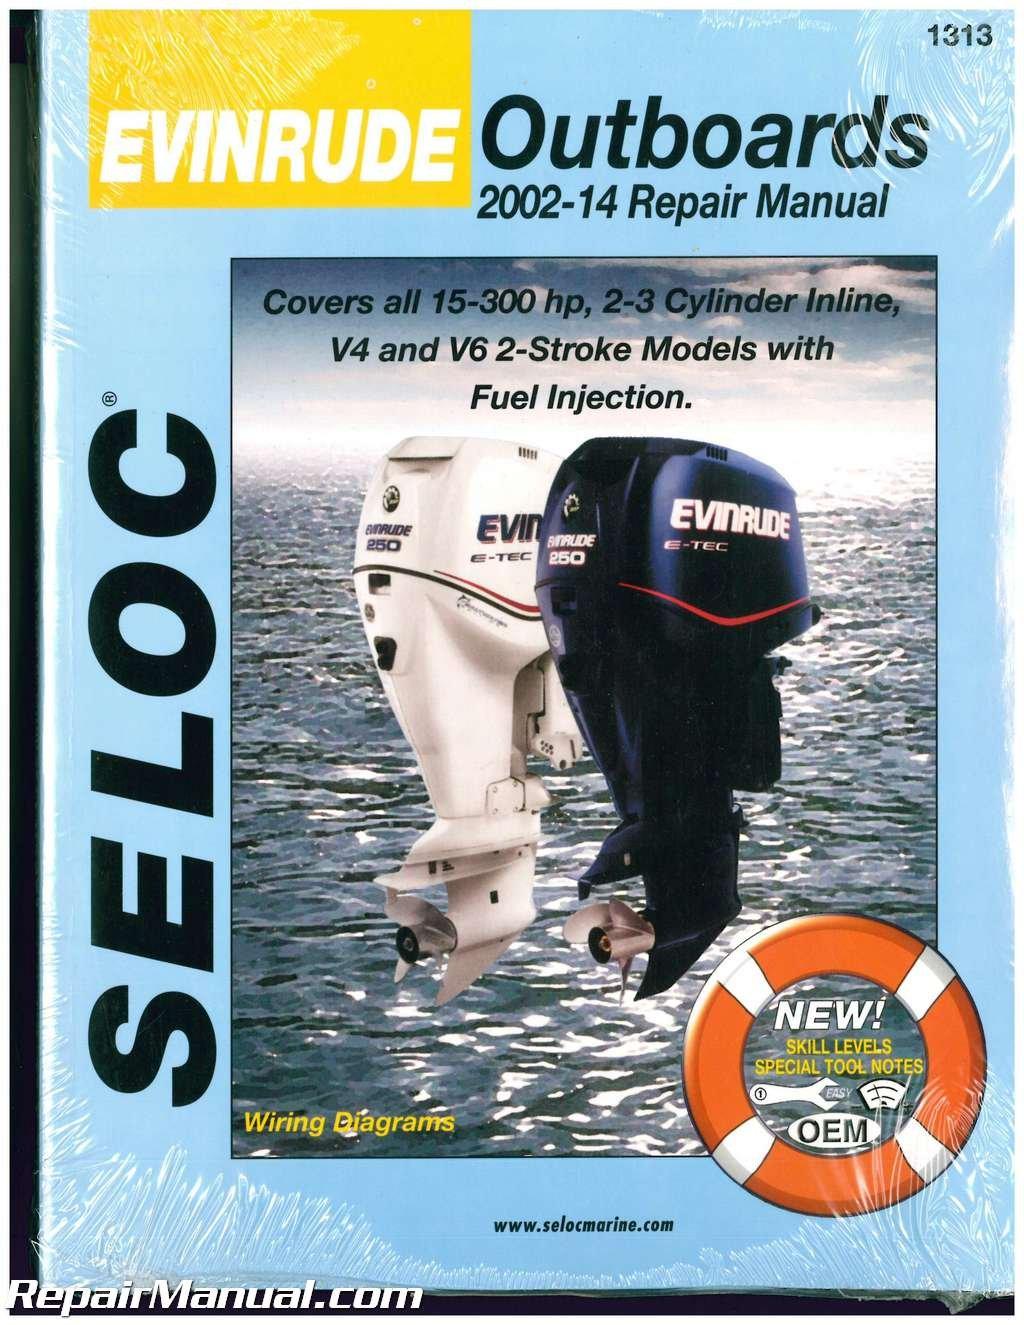 SL1313 Seloc 2002-2014 Evinrude 15-300 hp 2-Stroke Fuel Injected ETEC  Outboard Repair Manual: Manufacturer: Amazon.com: Books